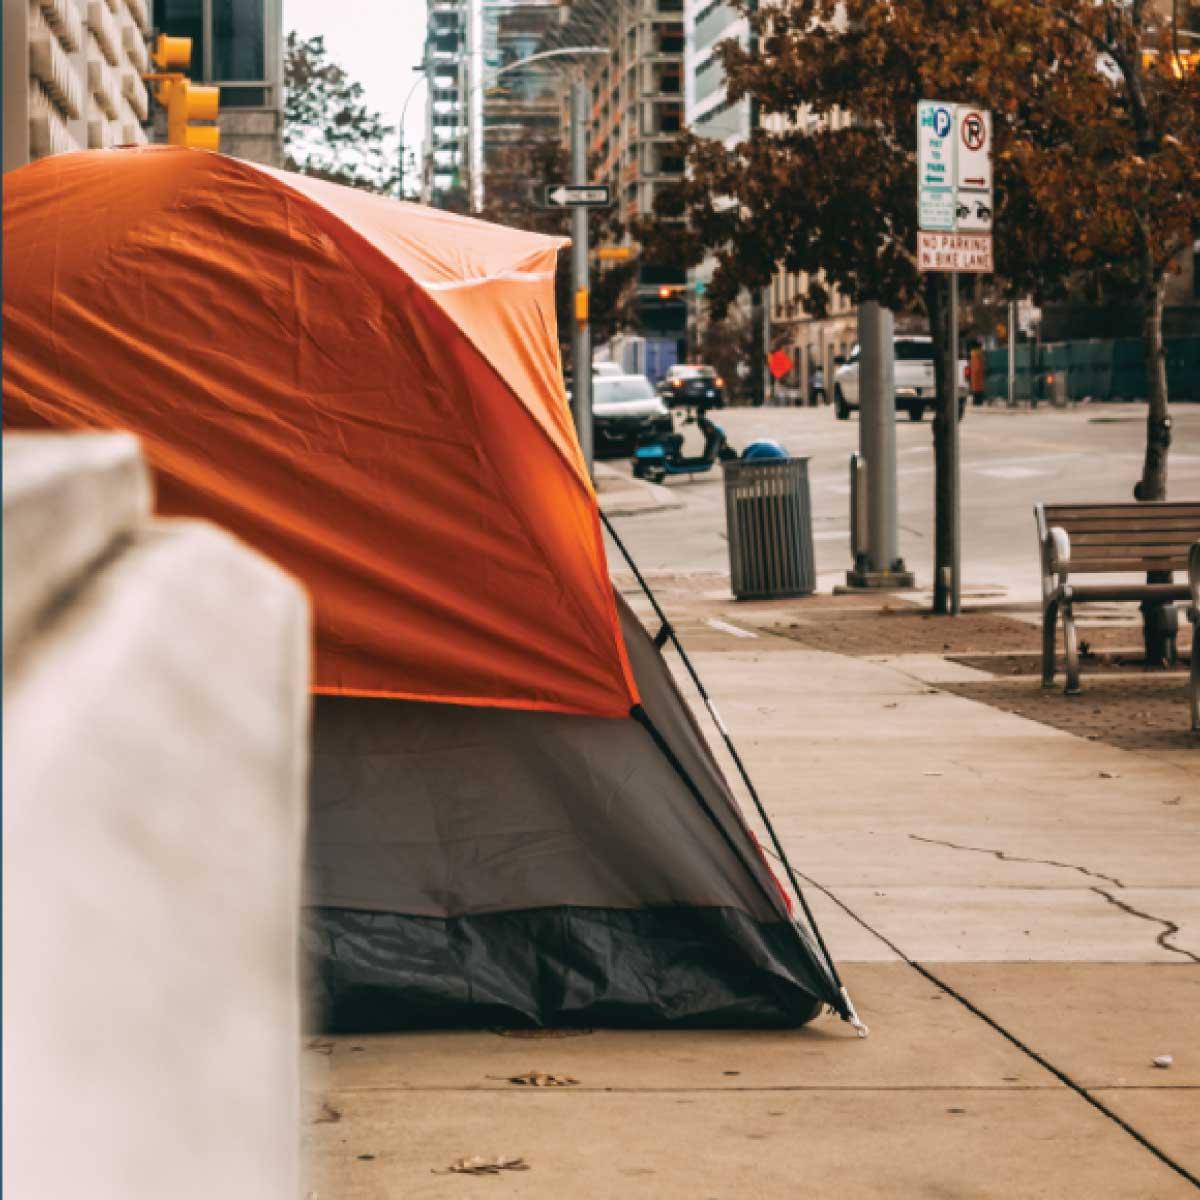 Homeless-less system management